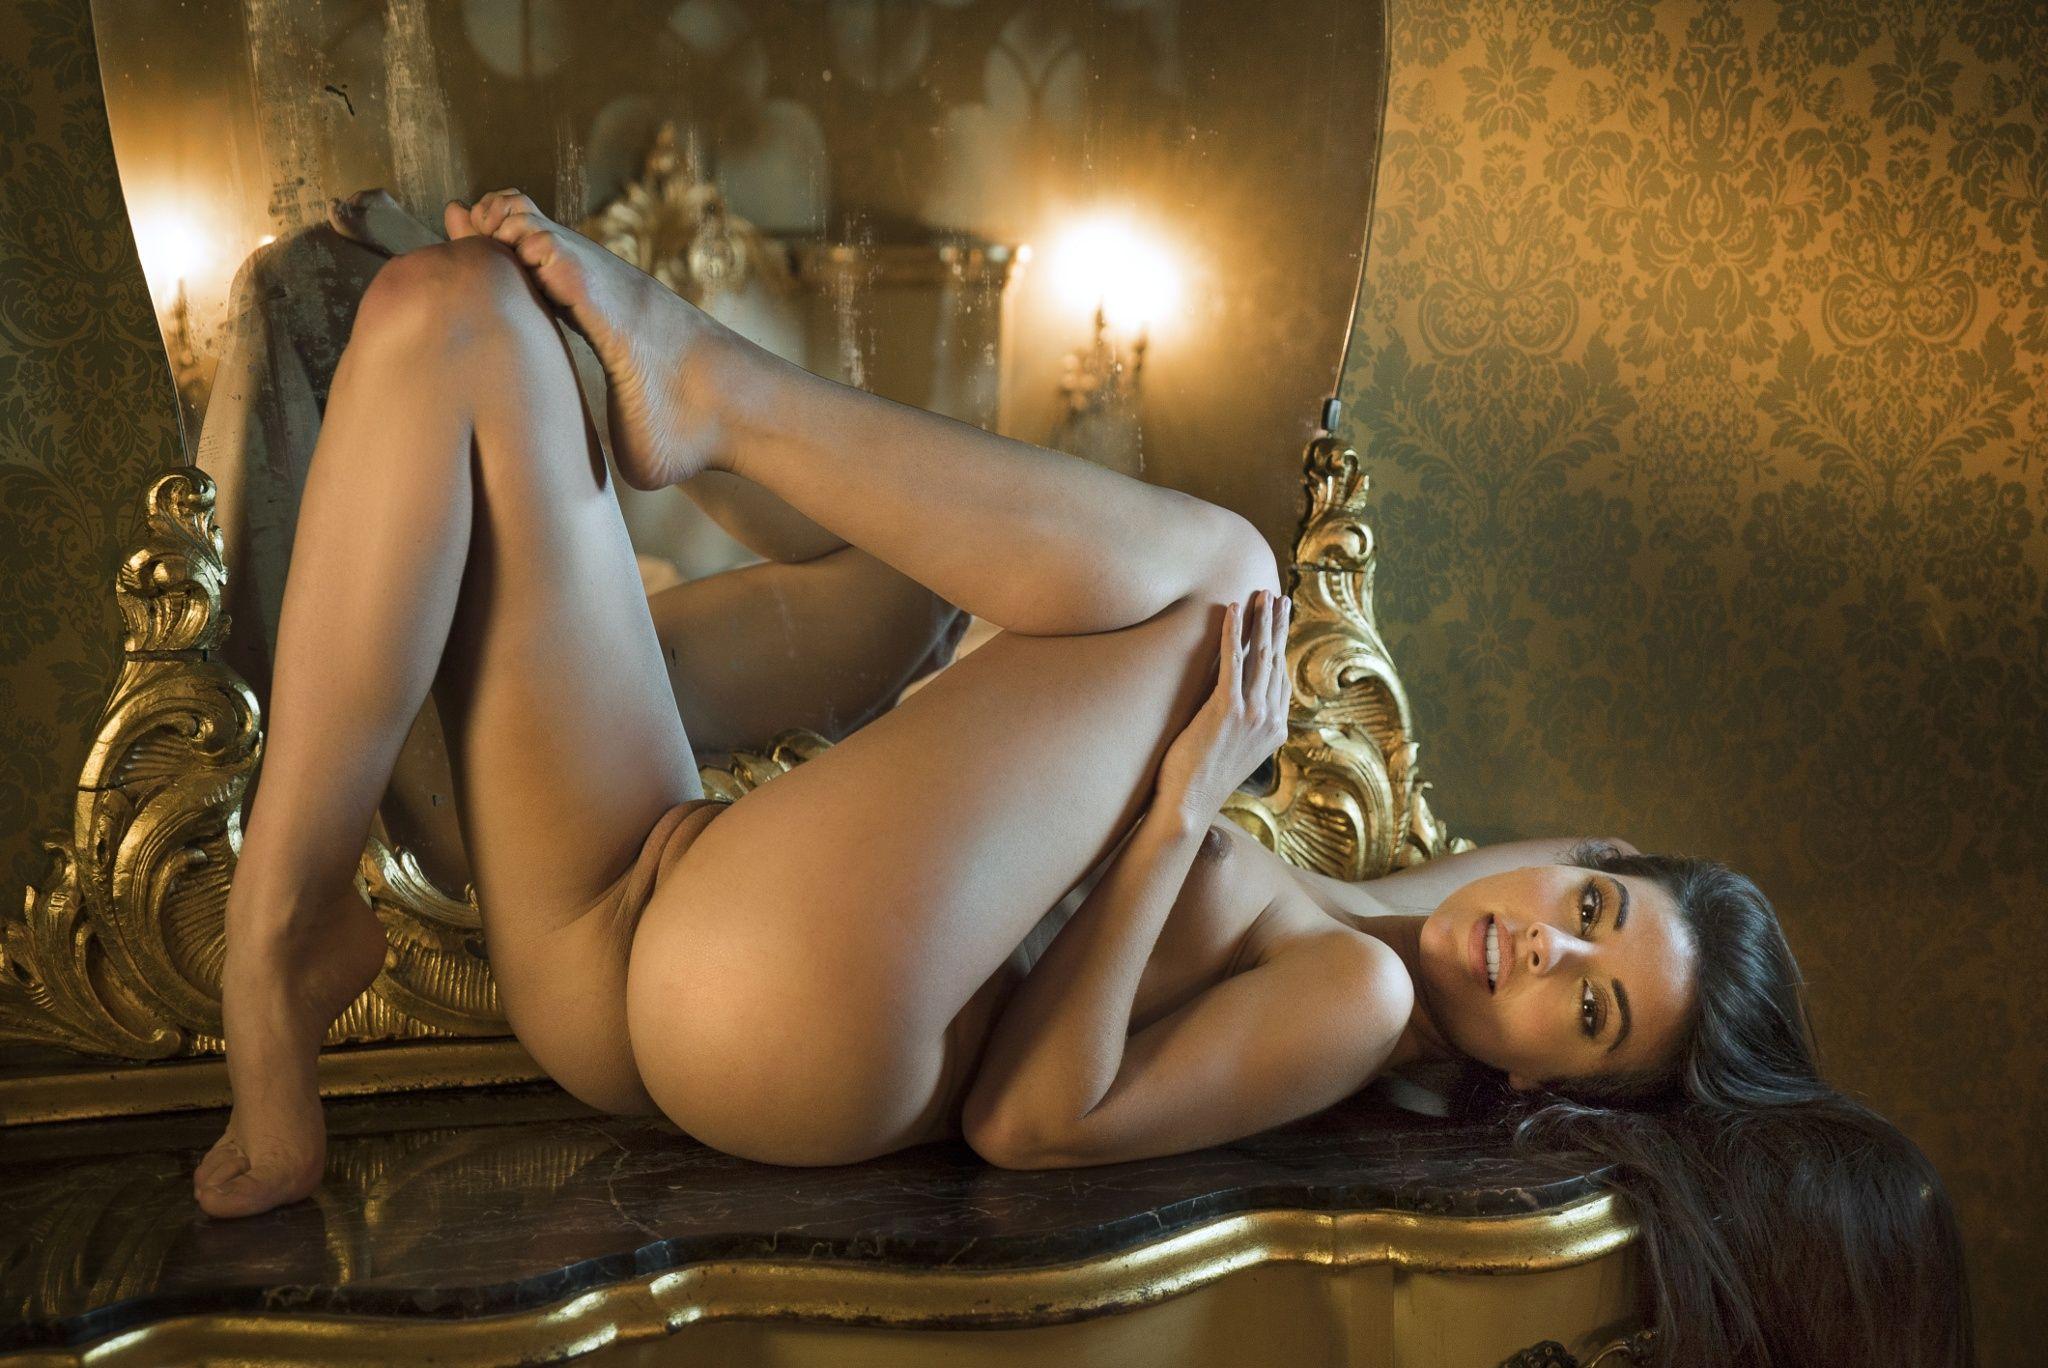 Curious julia de lucia bounces her ass on a thick hard cock - 3 part 10